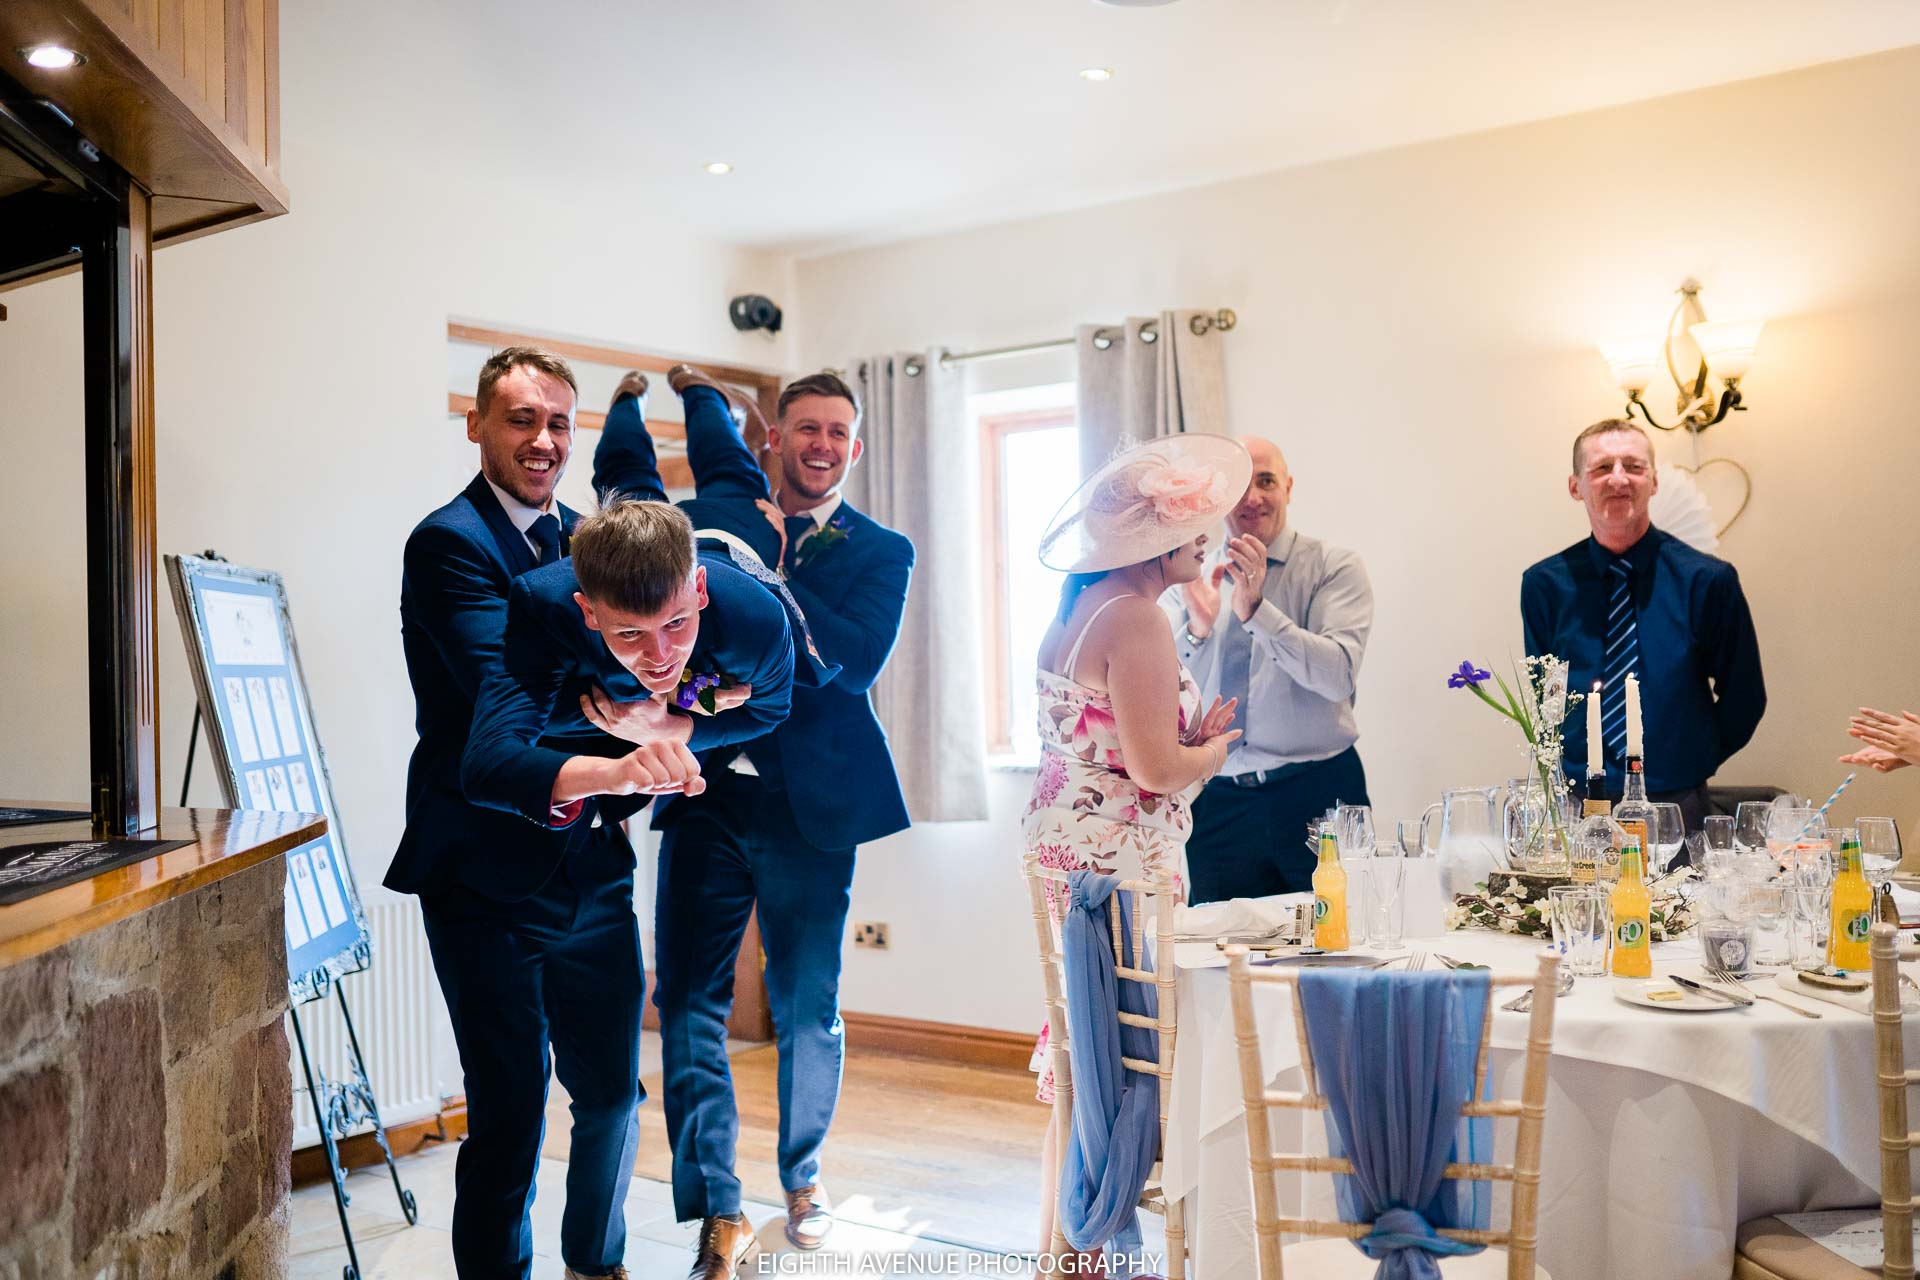 groomsmen entering the room